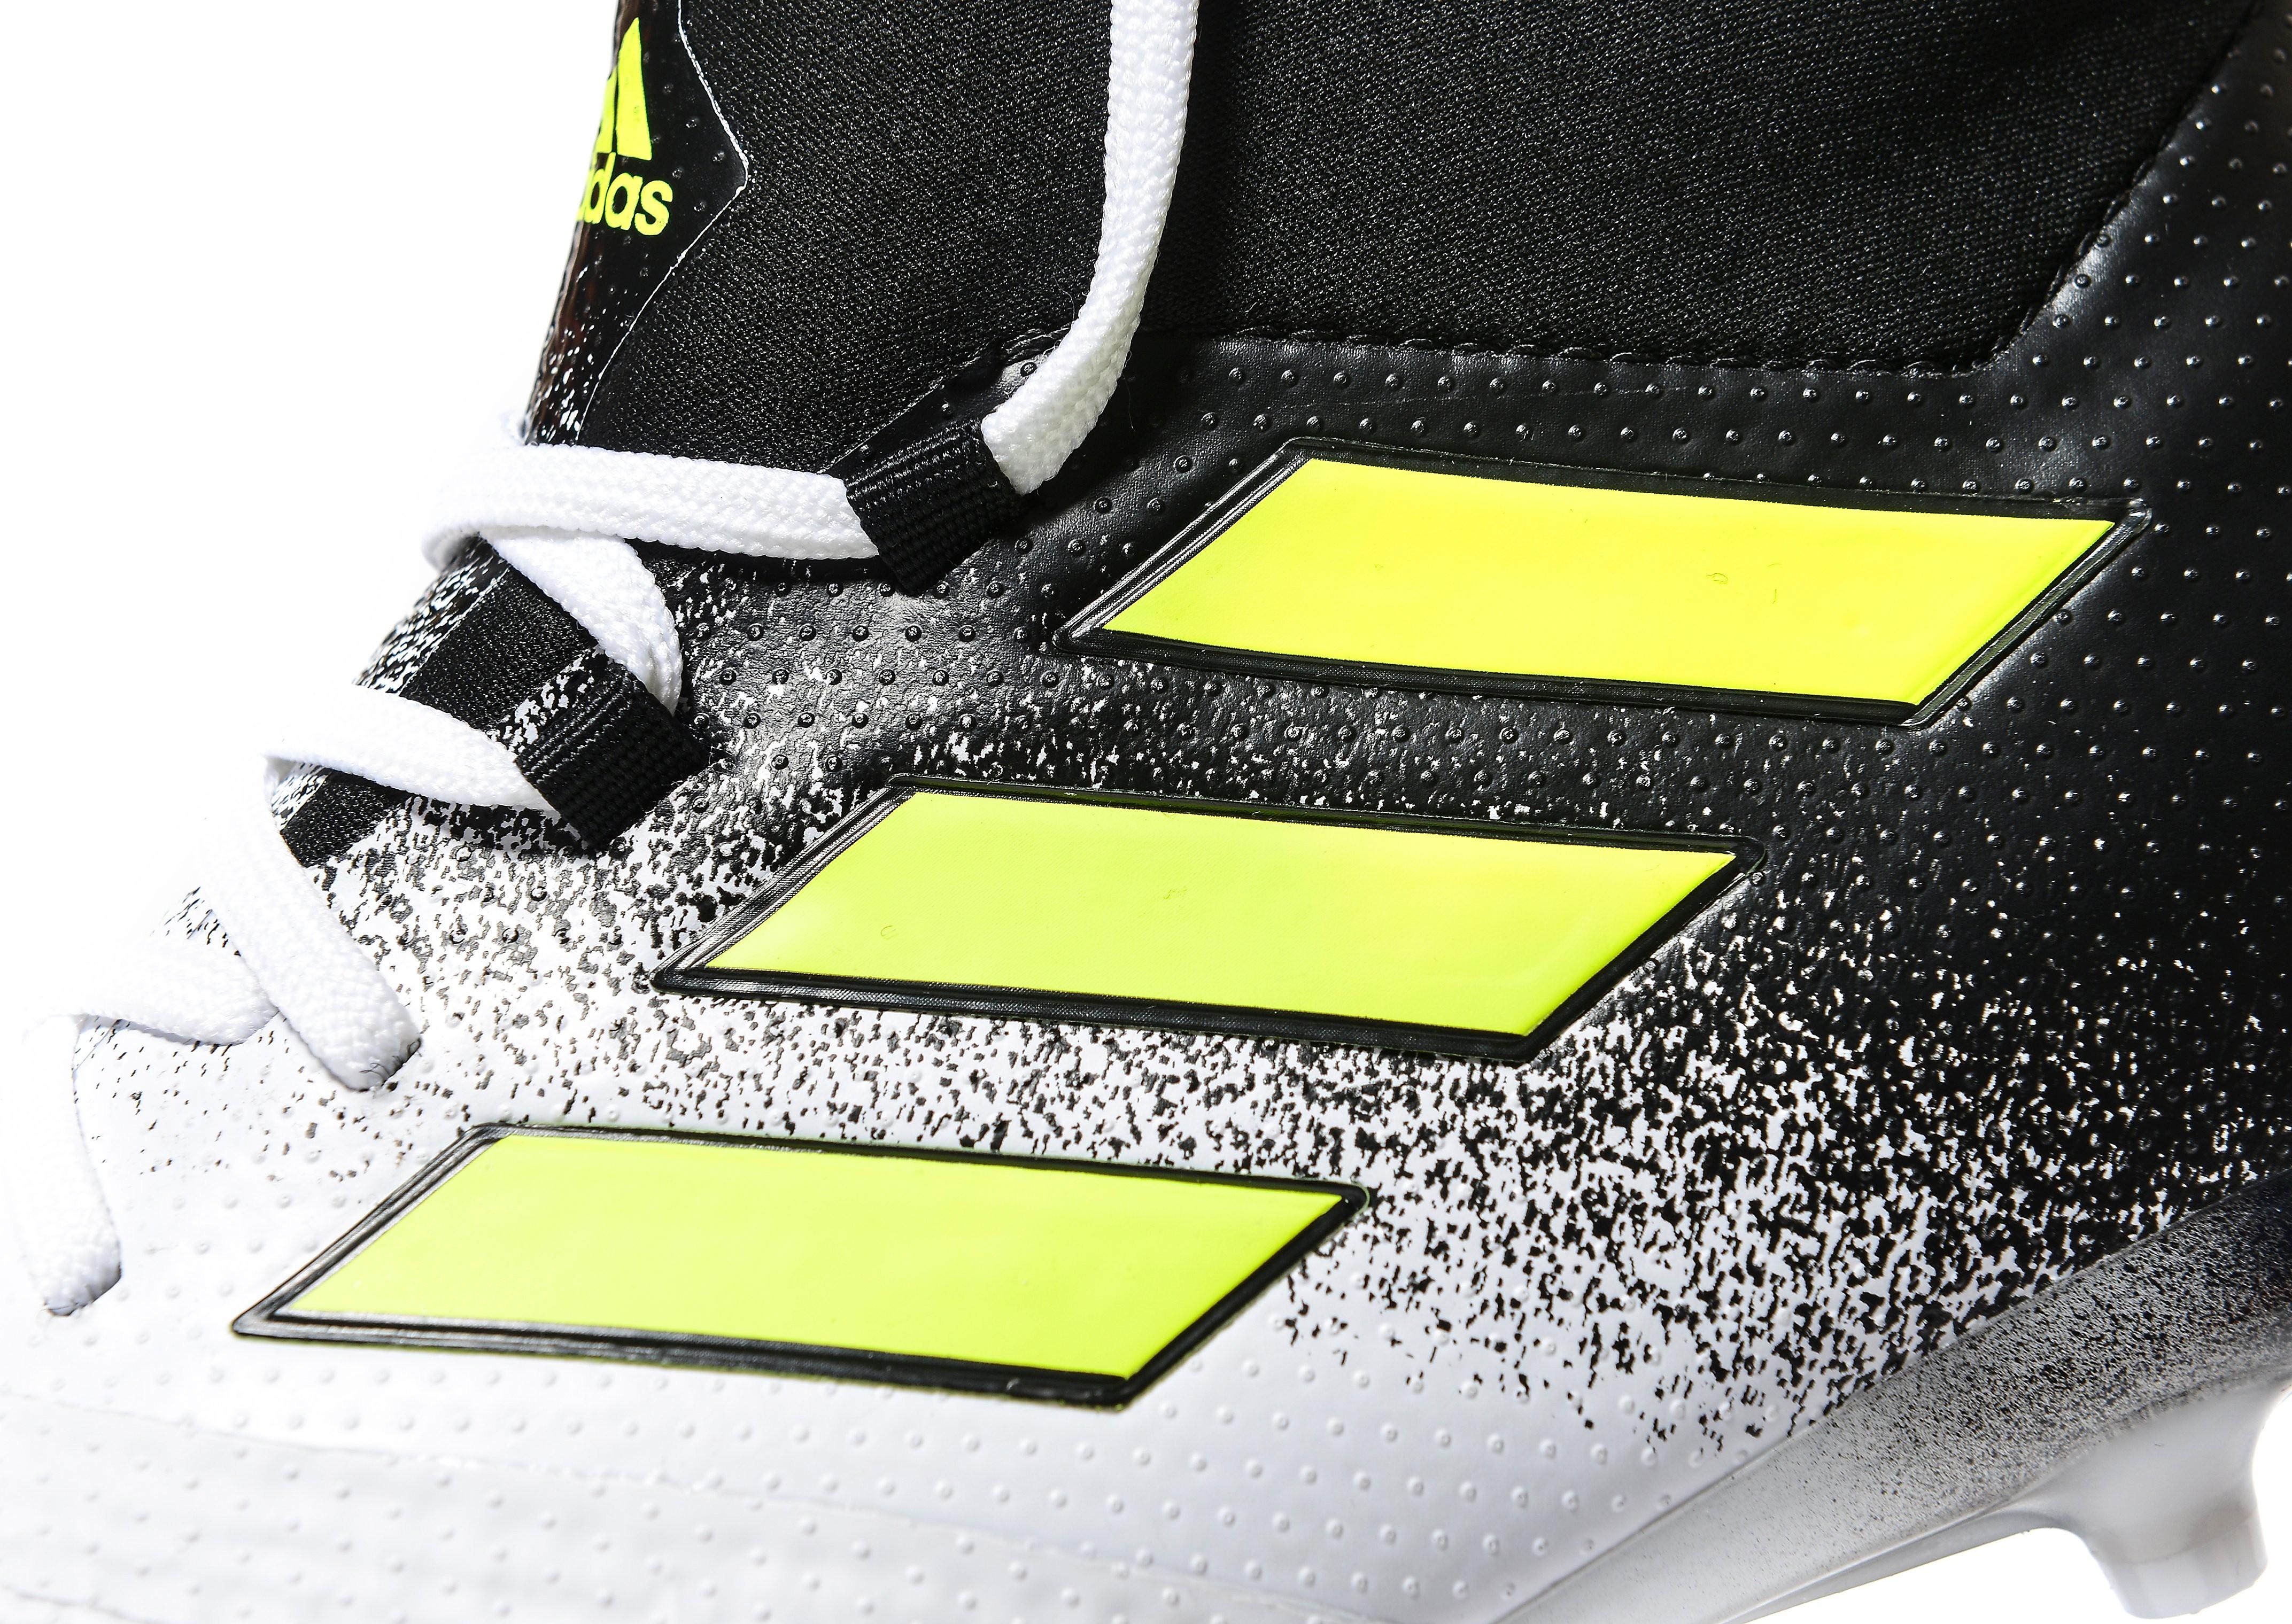 adidas Dust Storm ACE 17.1 Primeknit FG Junior